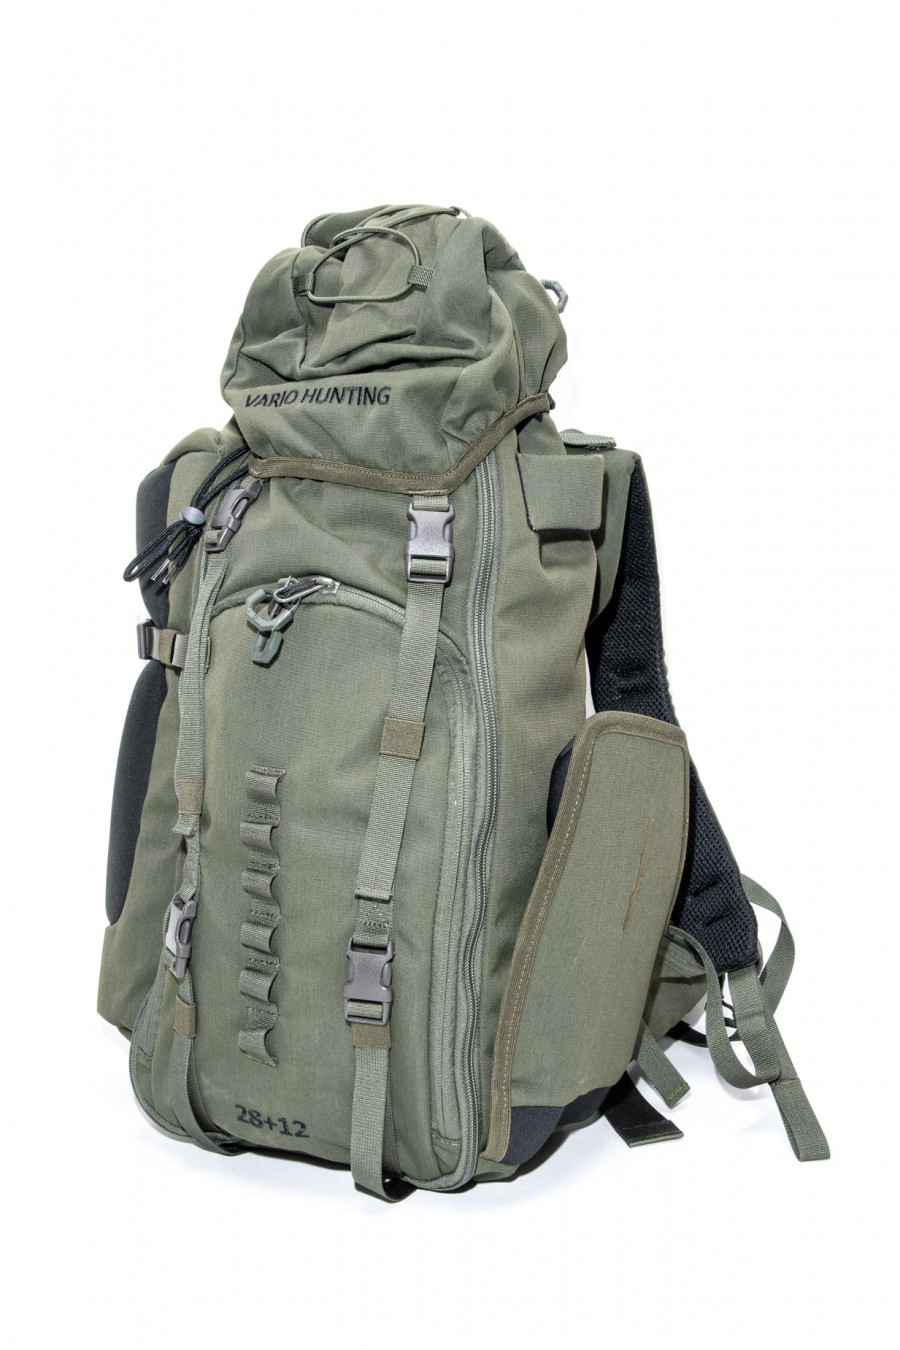 Vario Hunting Bag 28+12